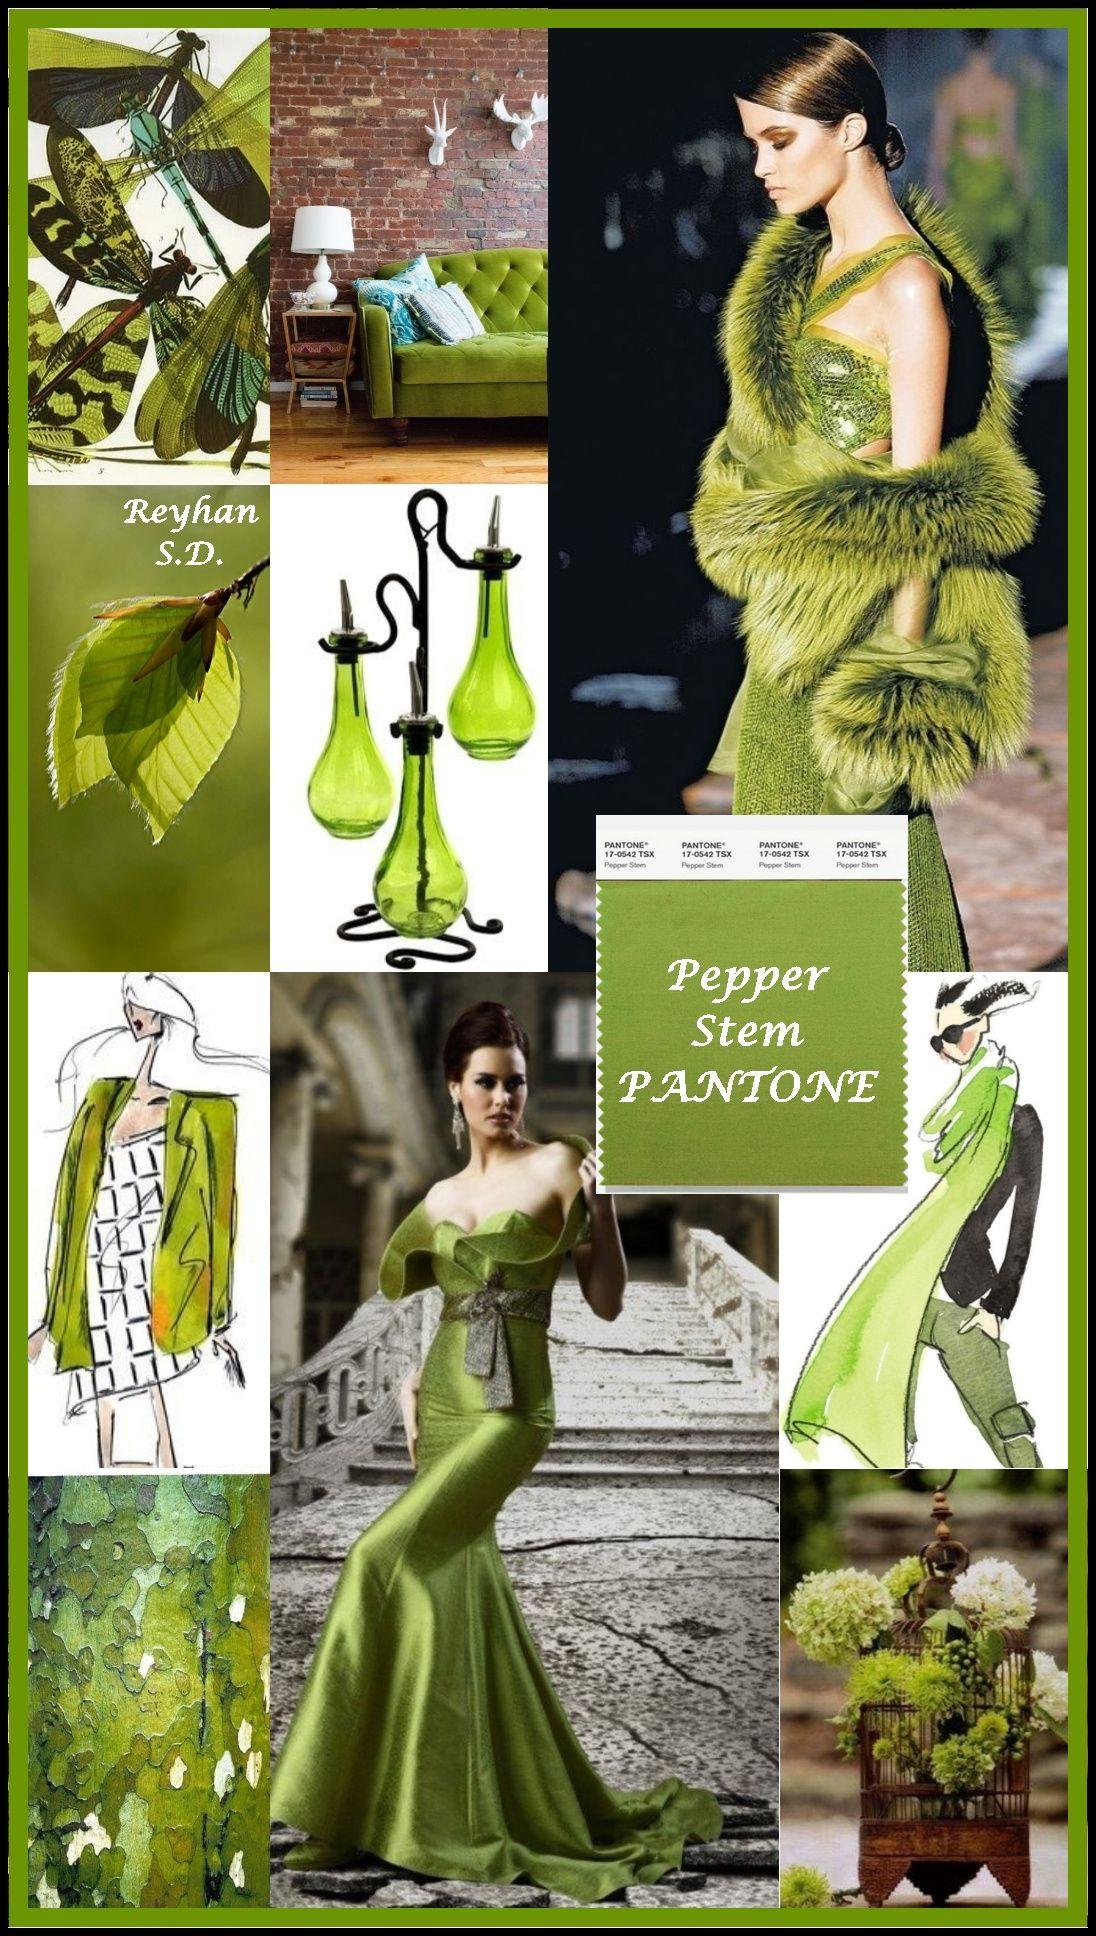 '' Pepper Stem - Pantone Spring/ Summer 2019 Color '' by ...